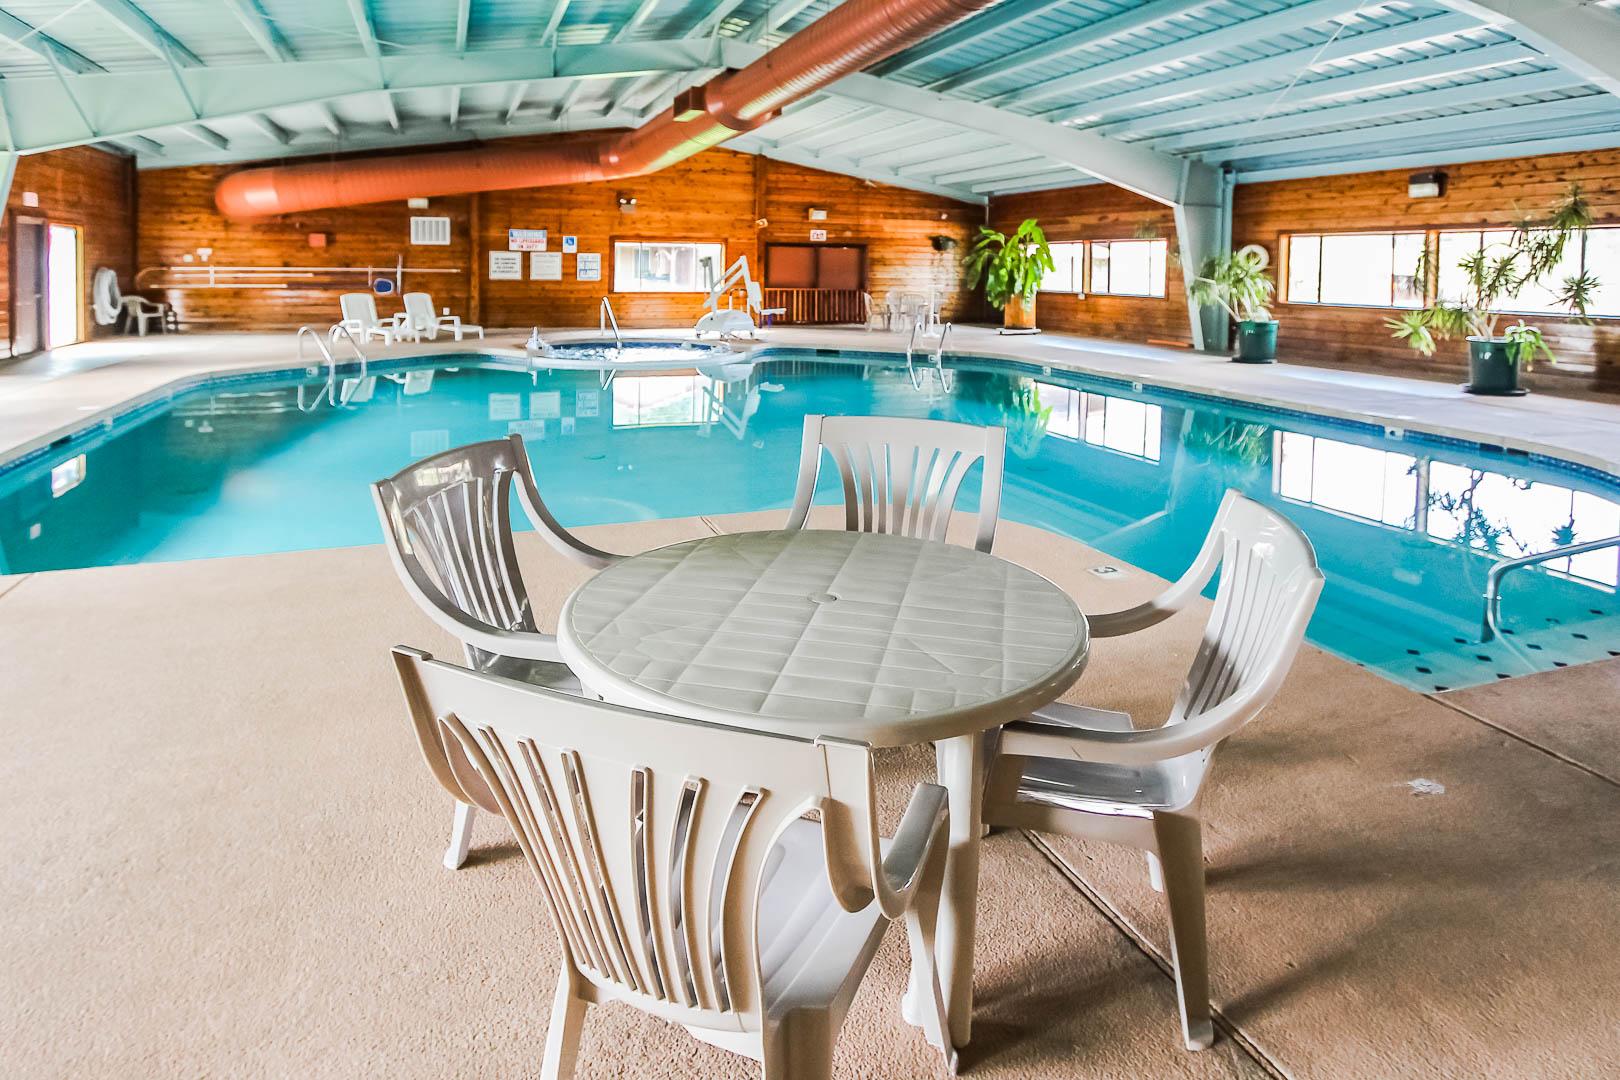 A spacious indoor swimming pool at VRI's Roundhouse Resort in Pinetop, Arizona.